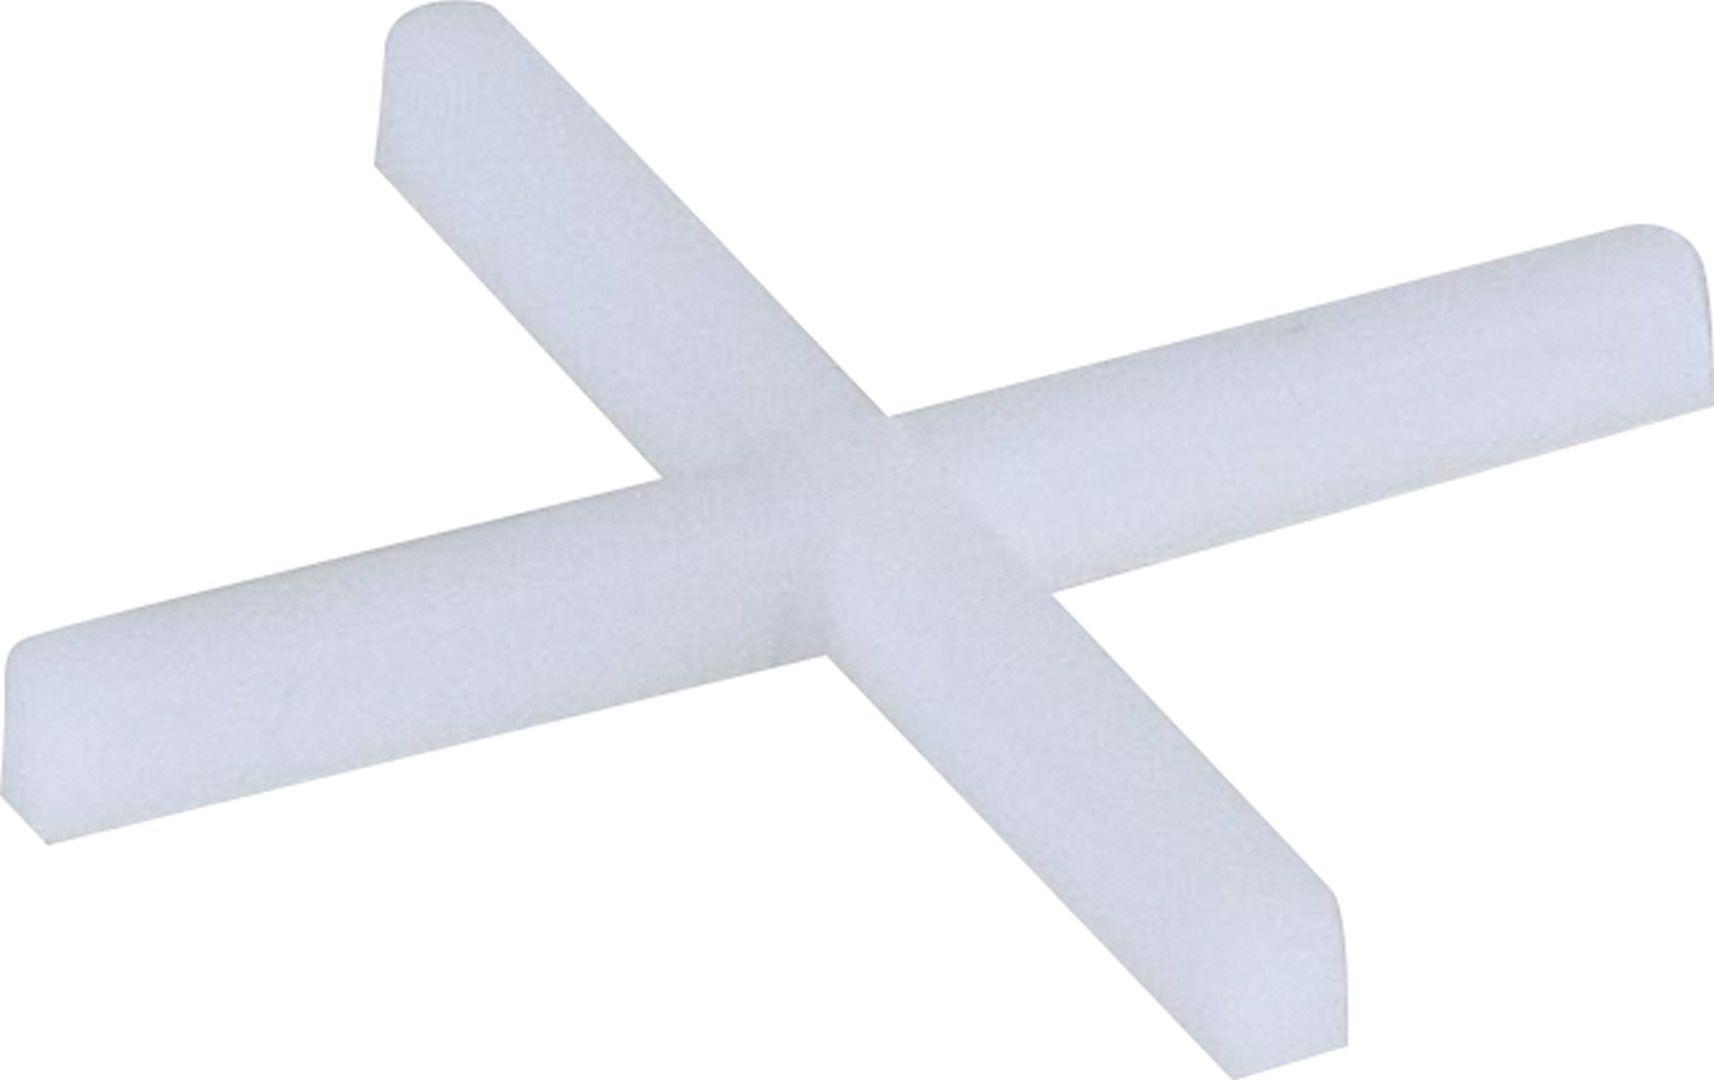 TRIUSO Fliesenkreuze aus Kunststoff, weiß, 250 Stück, 3,0 mm